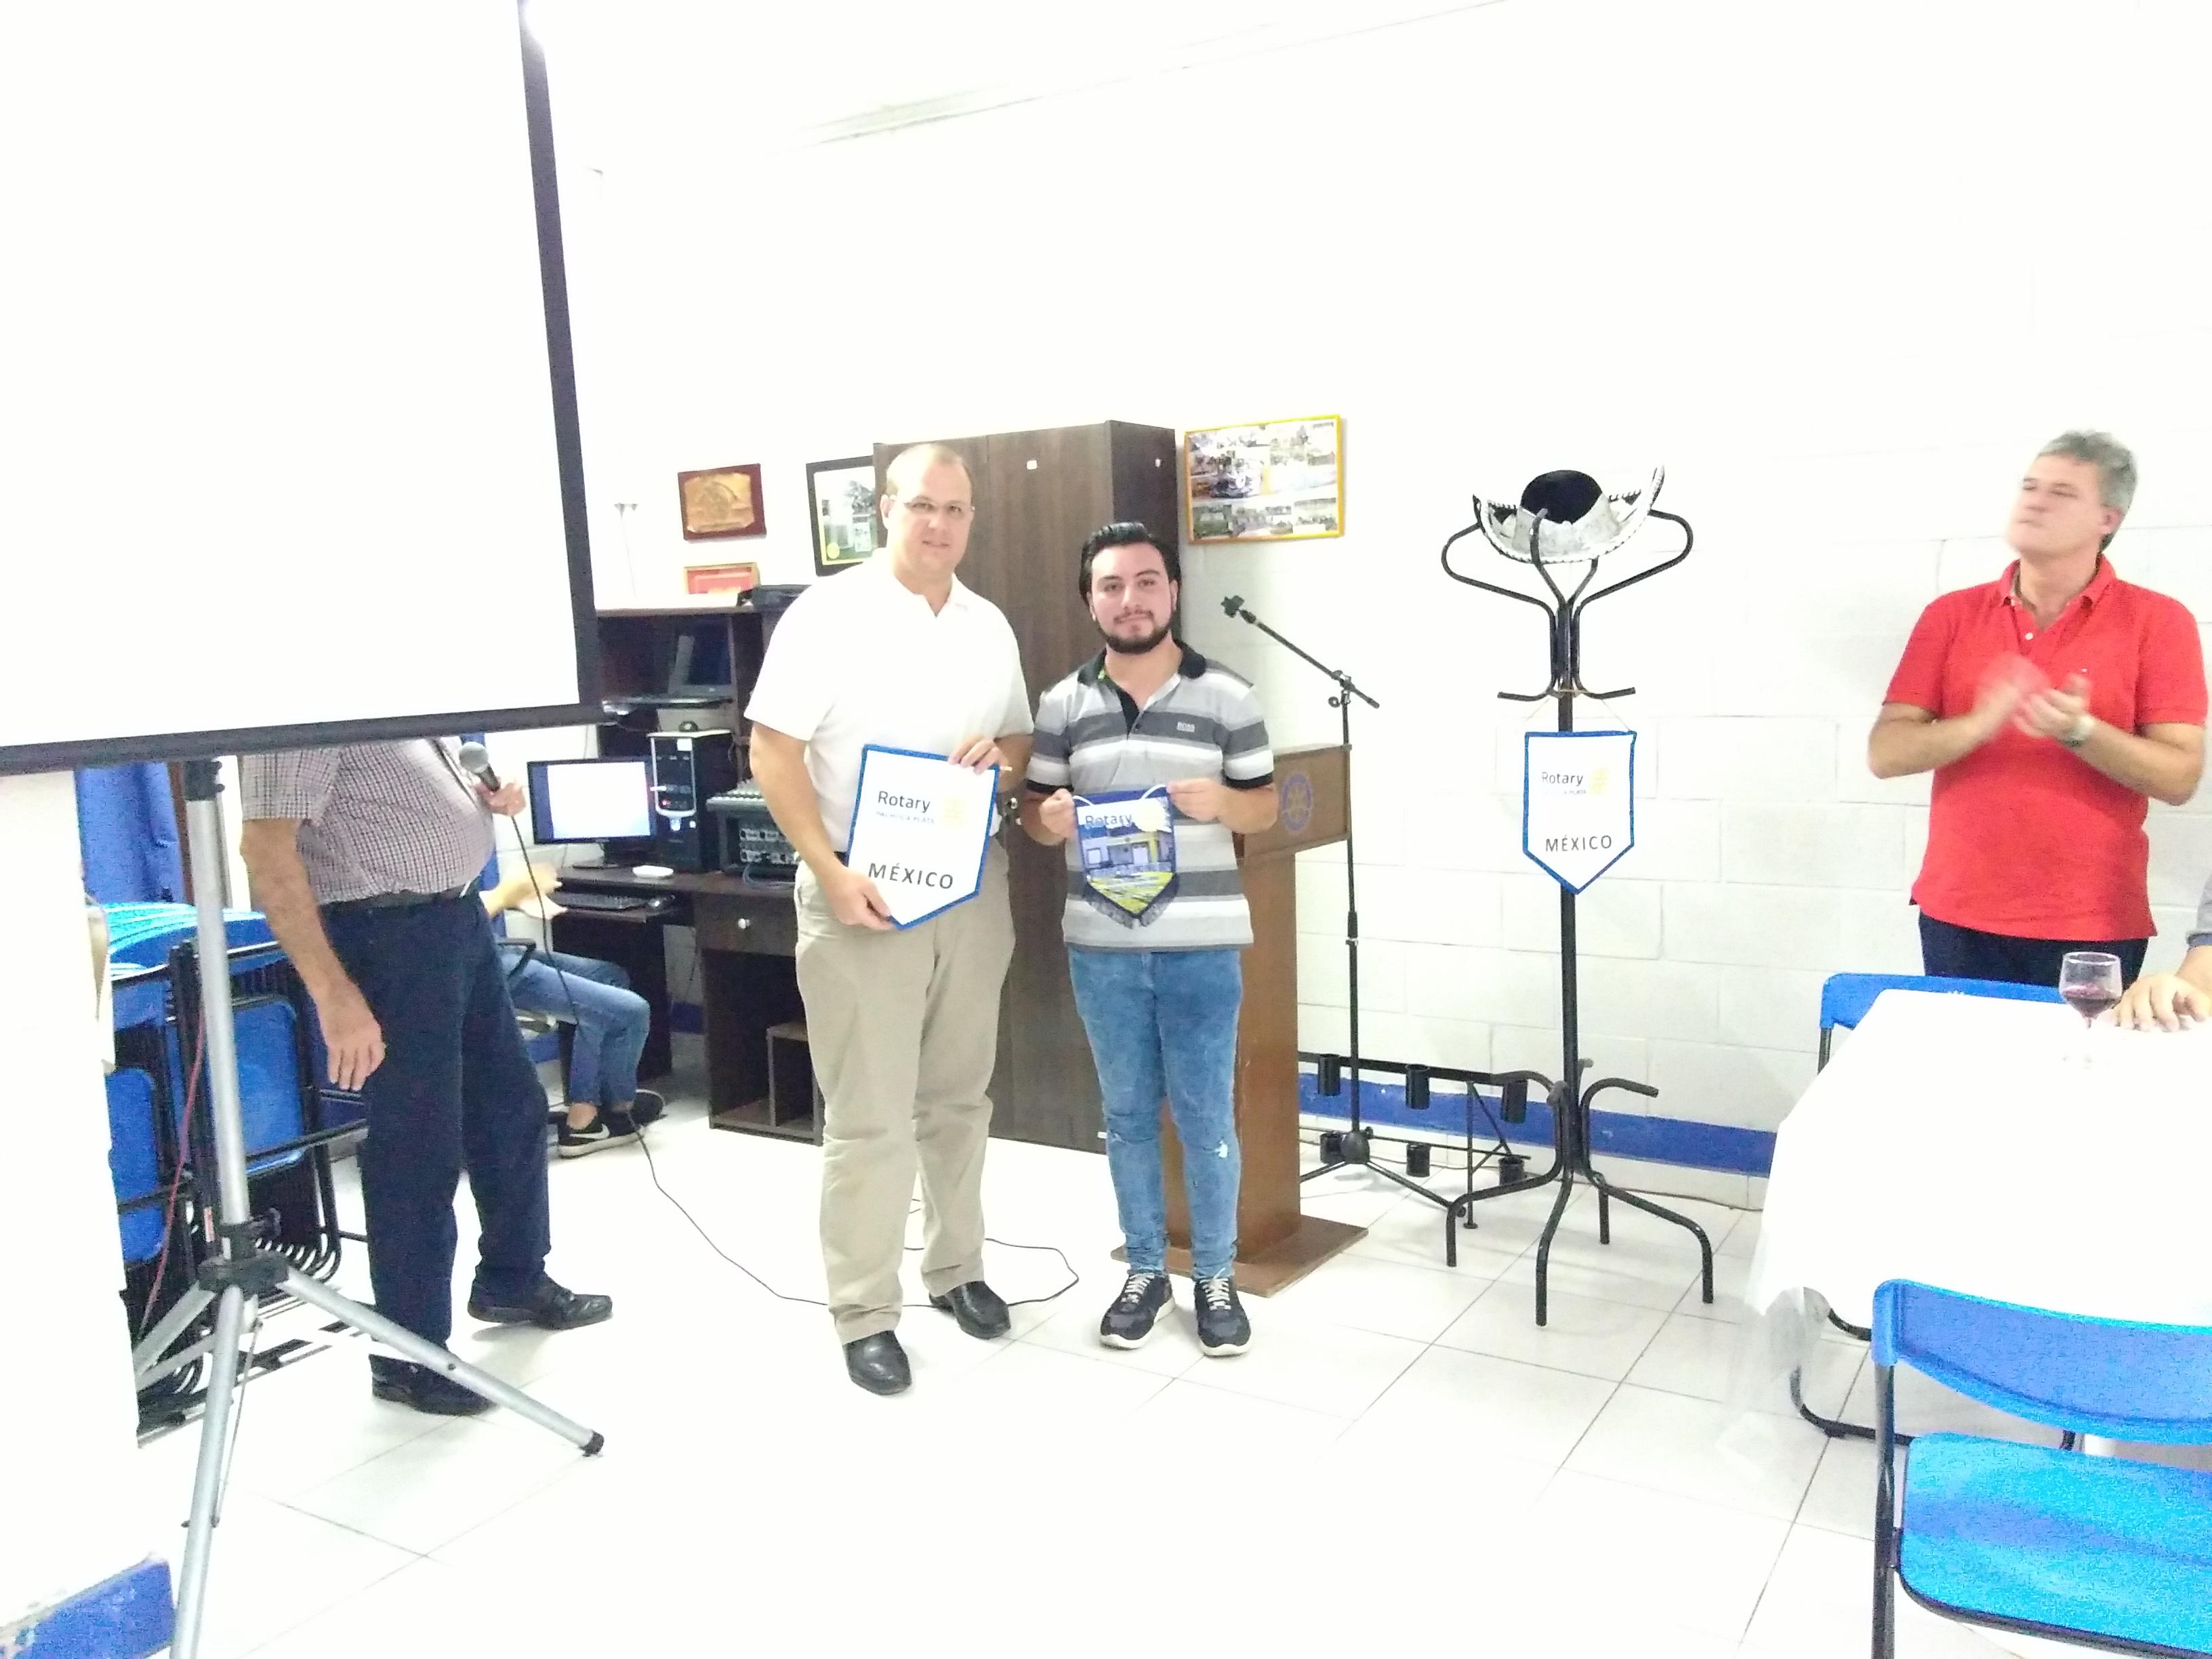 Rotary Club Pilar: Intercambios